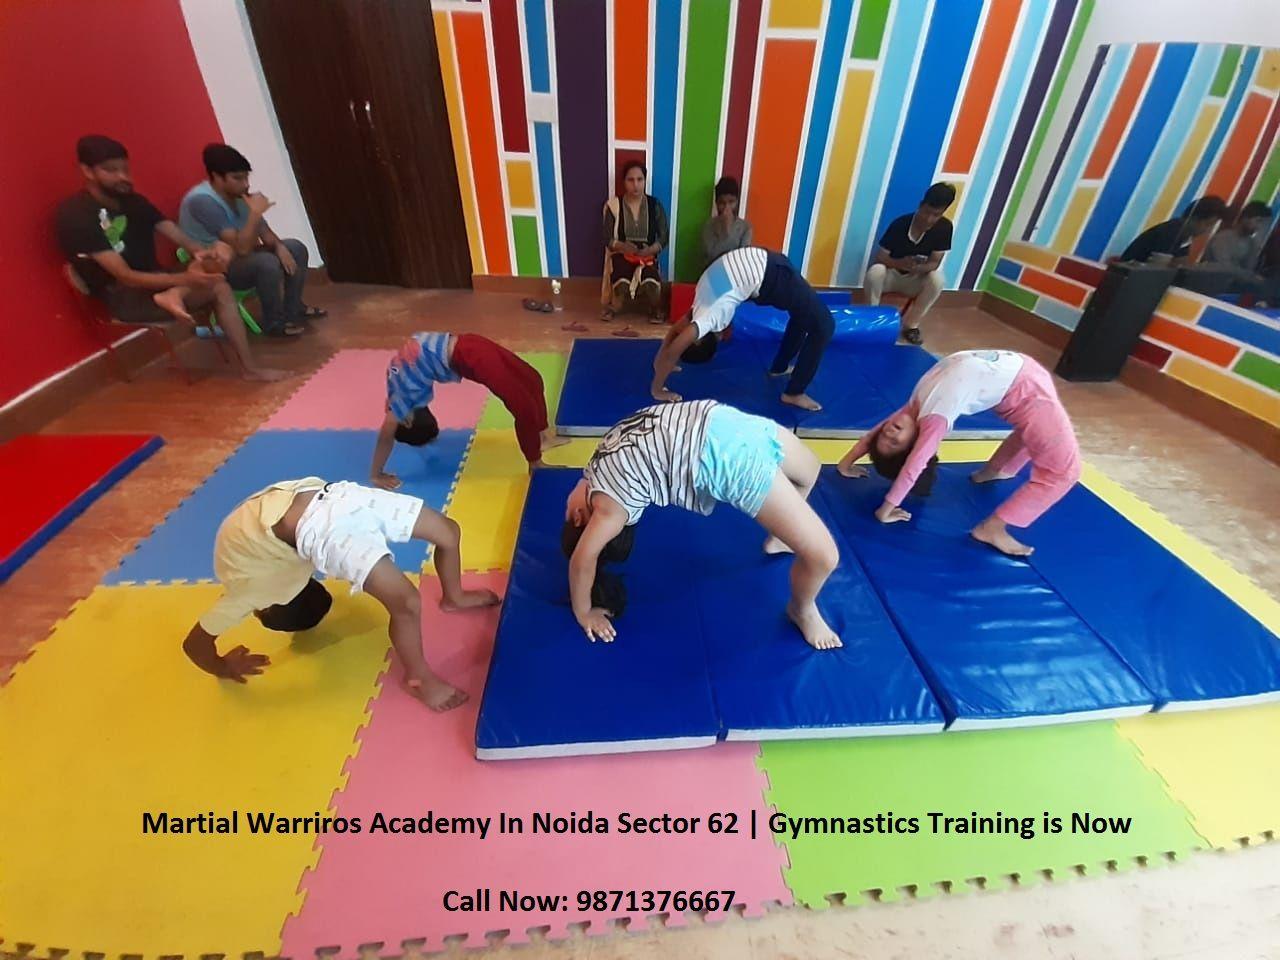 Gymnastics classes for kids in indirapuram gymnastics